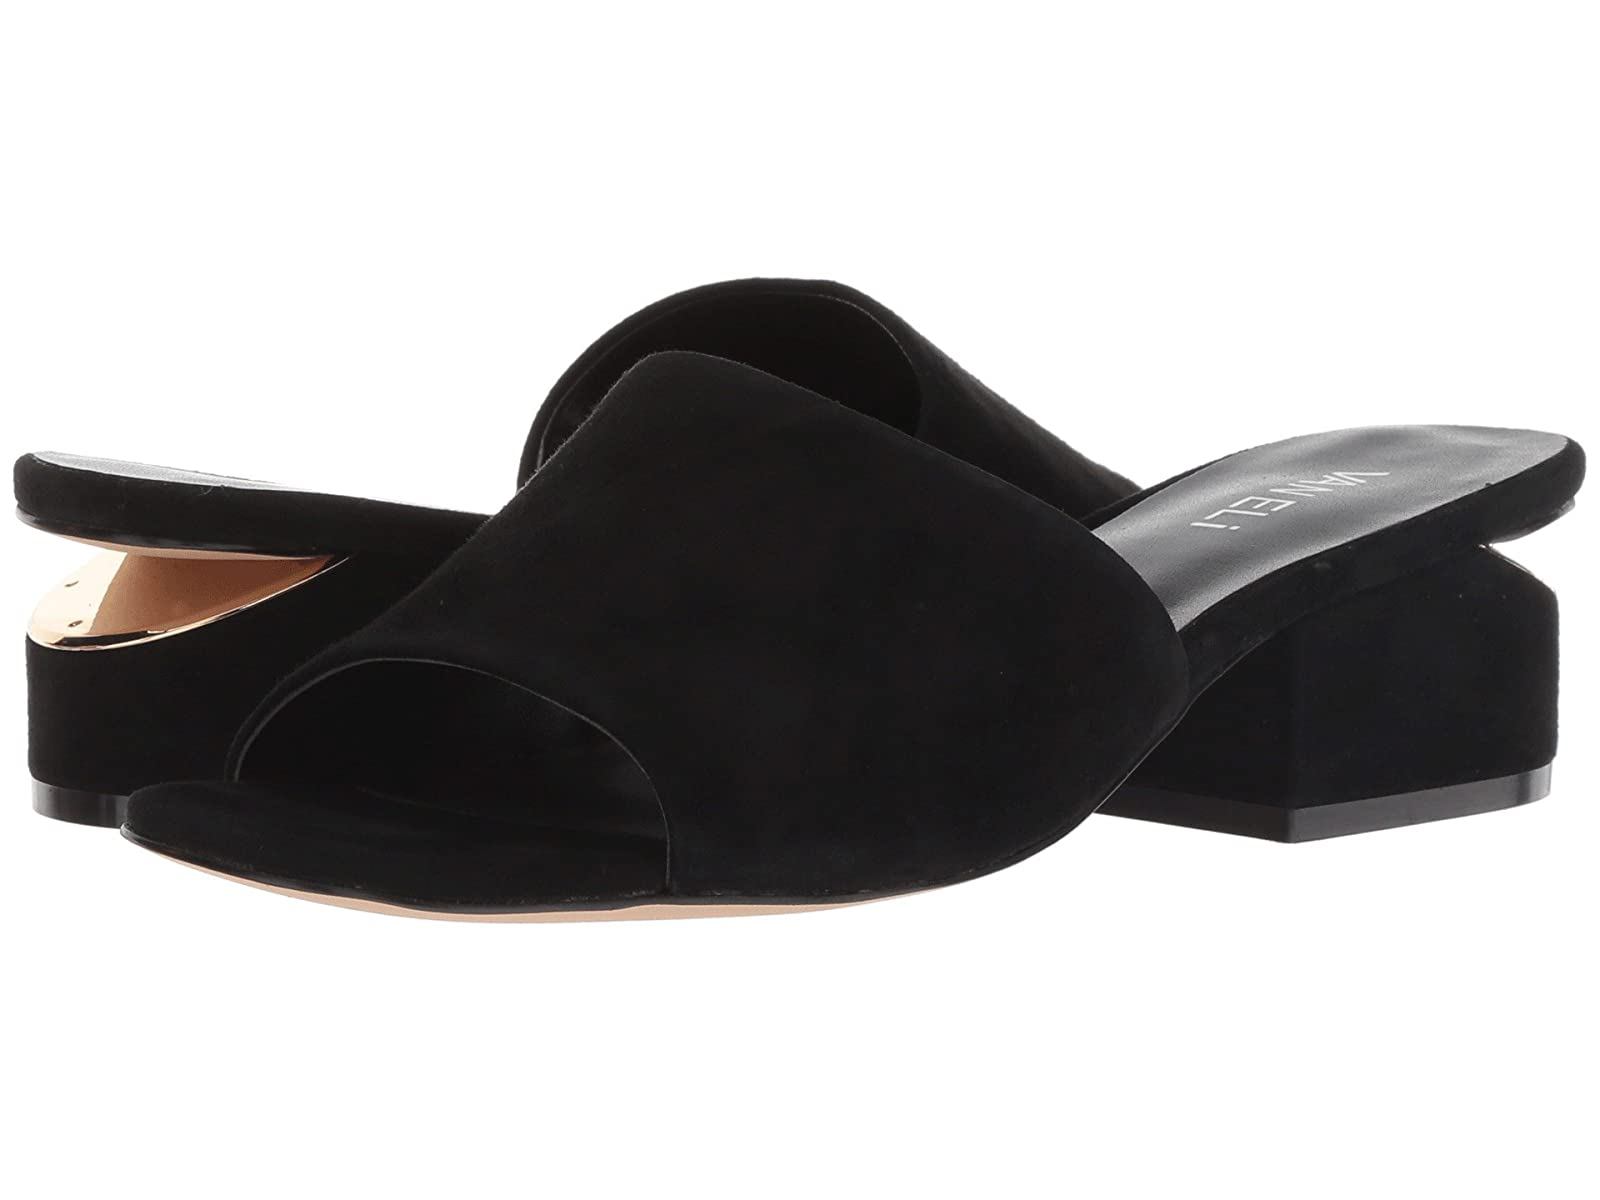 Vaneli PinyAtmospheric grades have affordable shoes